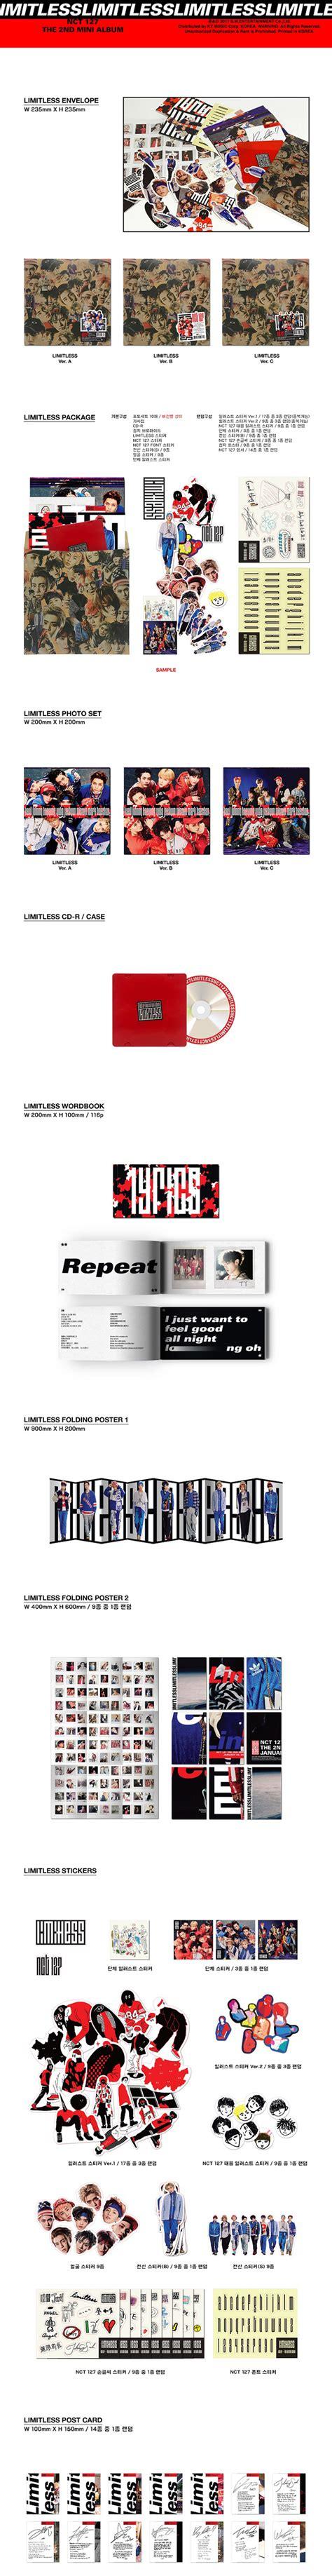 Casing Handphone Kpop Nct 127 The 2nd Mini Album Jaehyun nct 127 limitless 2nd mini album cd